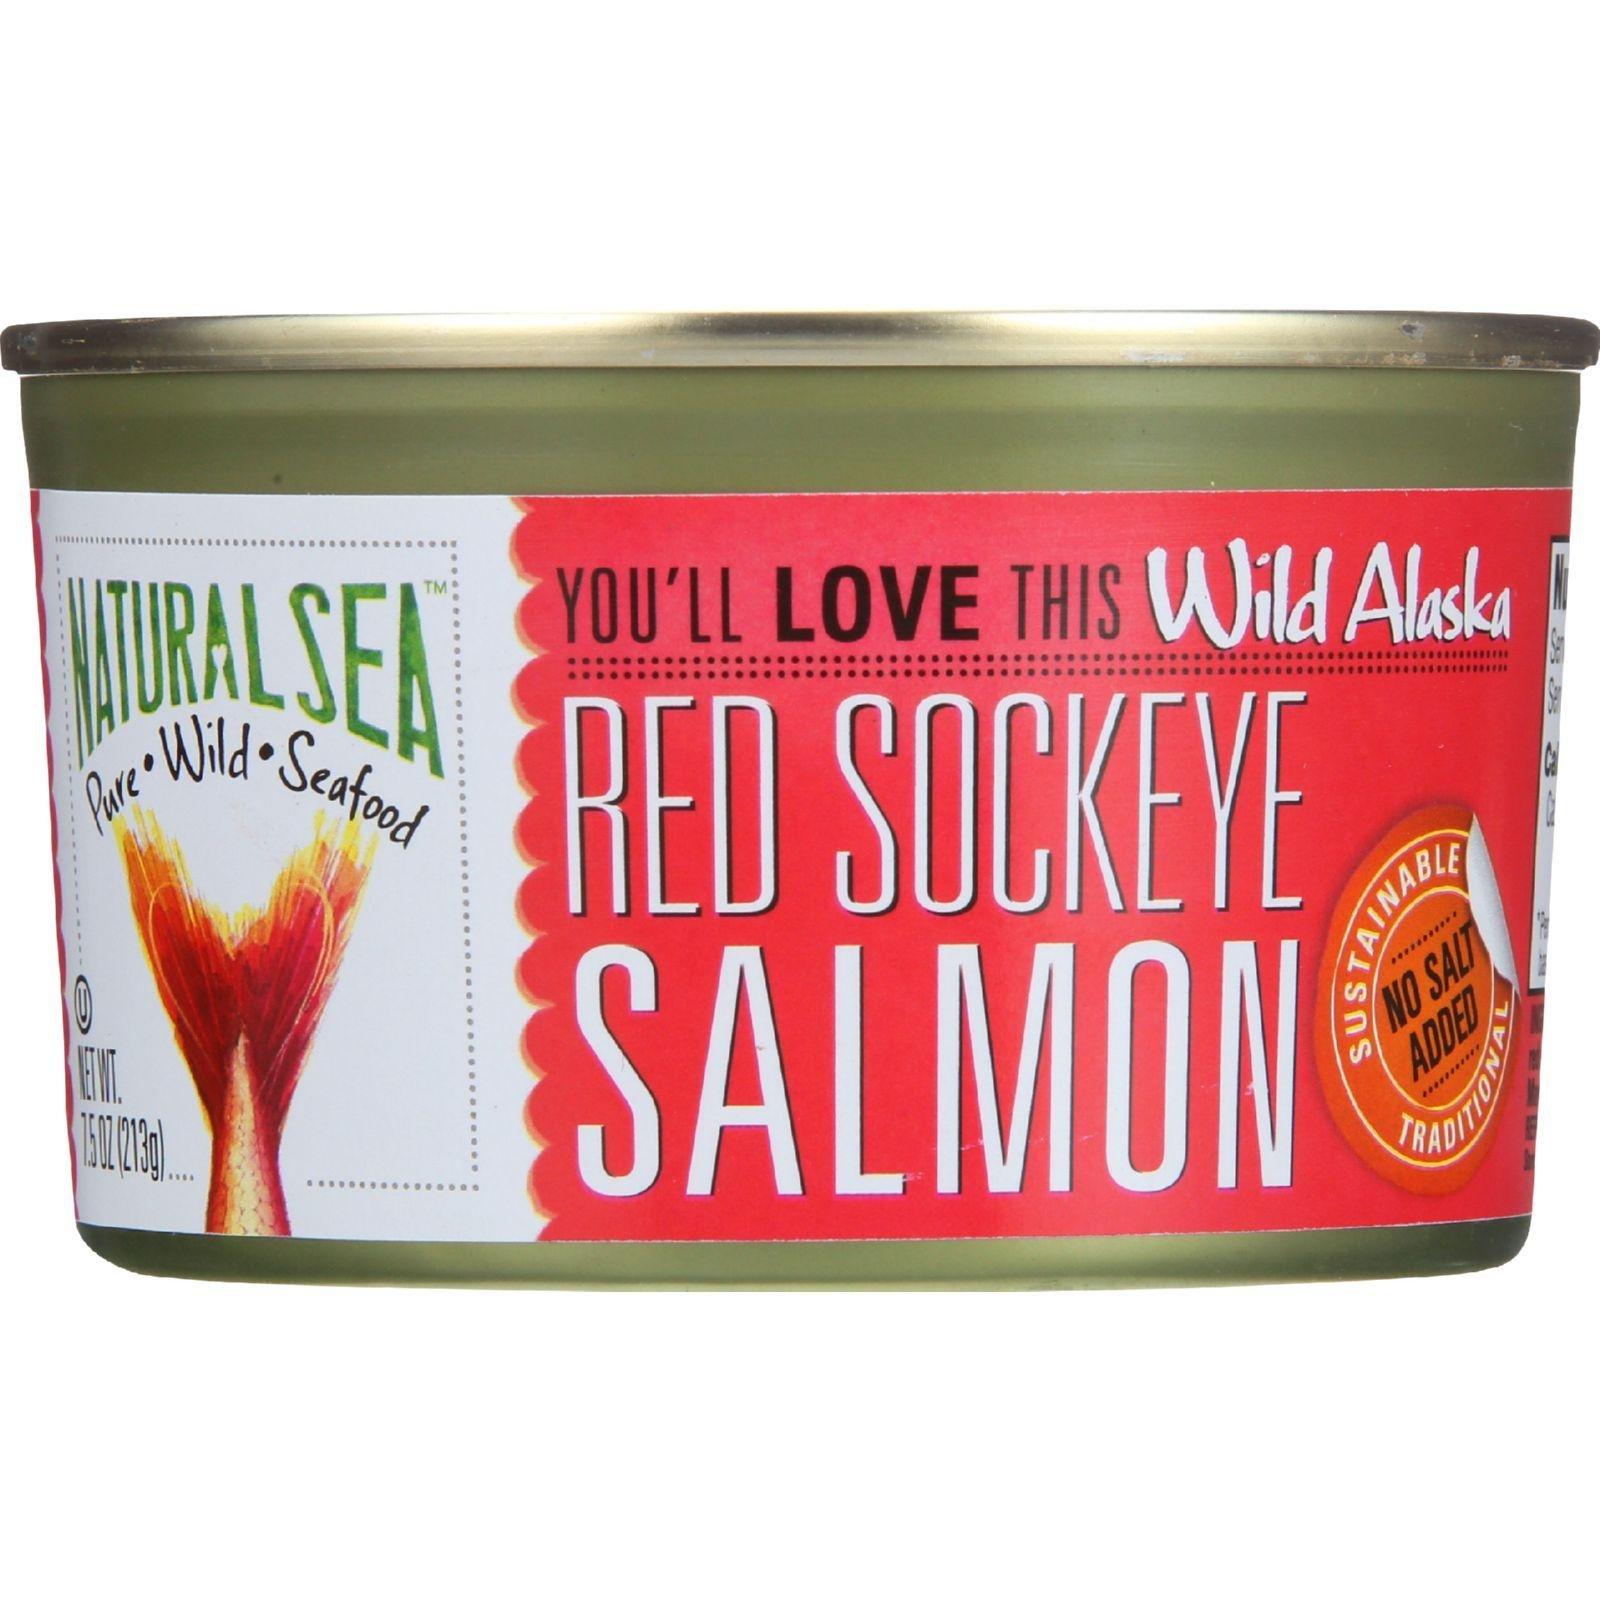 Natural Sea Red Sockeye No Salt Added 7.5 Oz (Pack of 24)